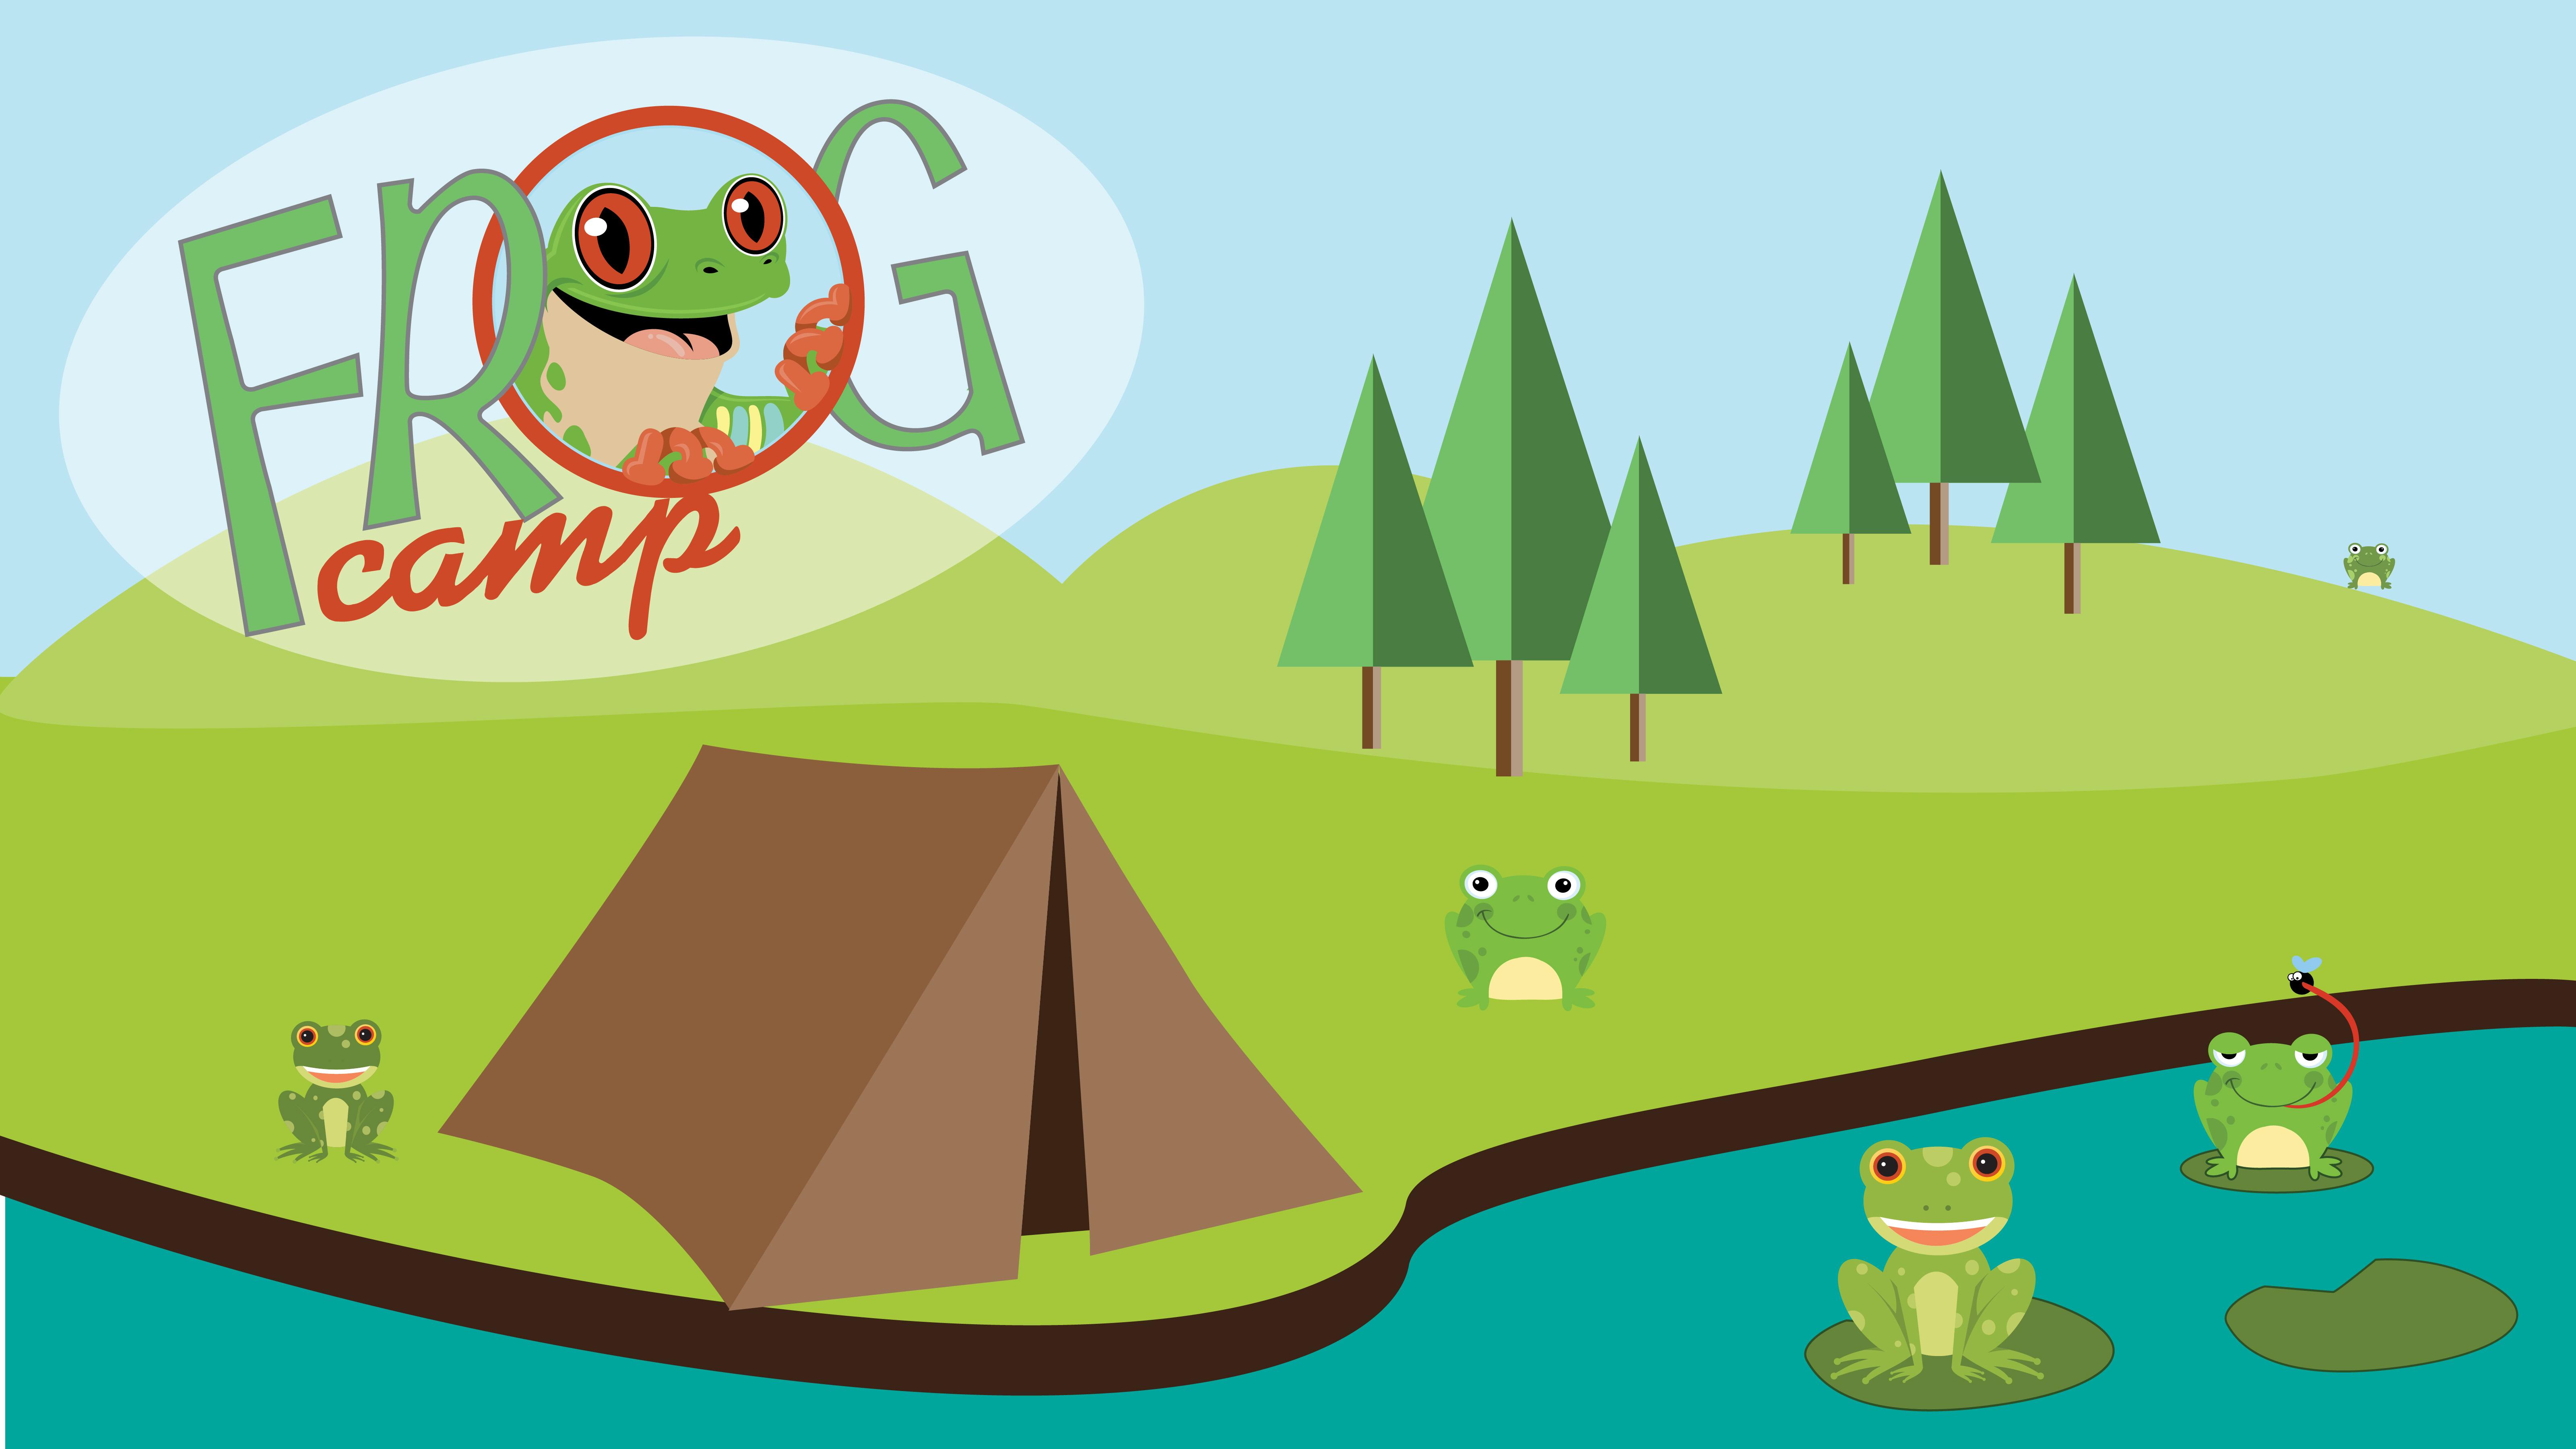 Frog camp mobile wide 01